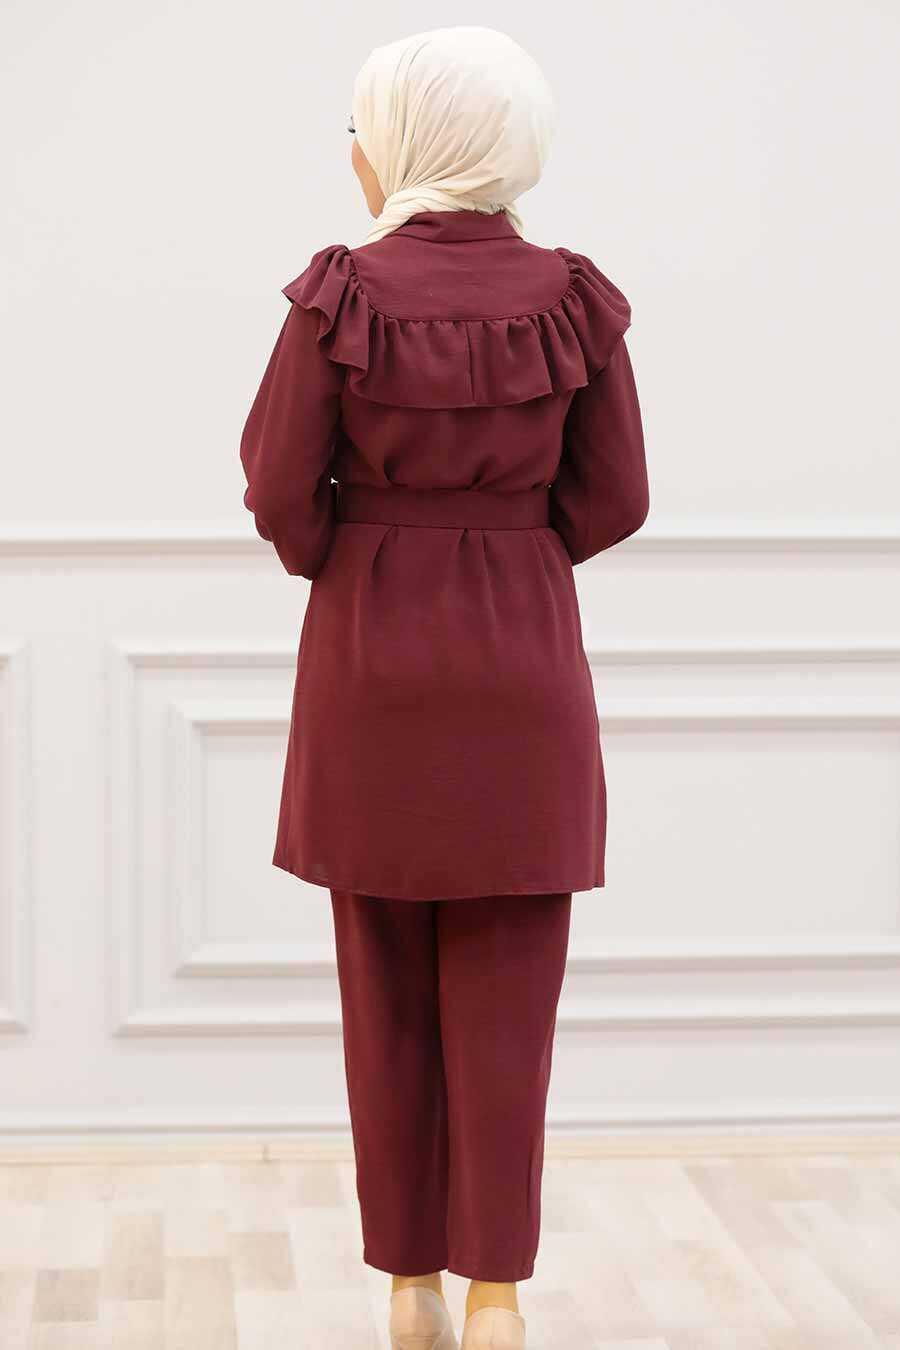 Claret Red Hijab Dual Suit Dress 14701BR